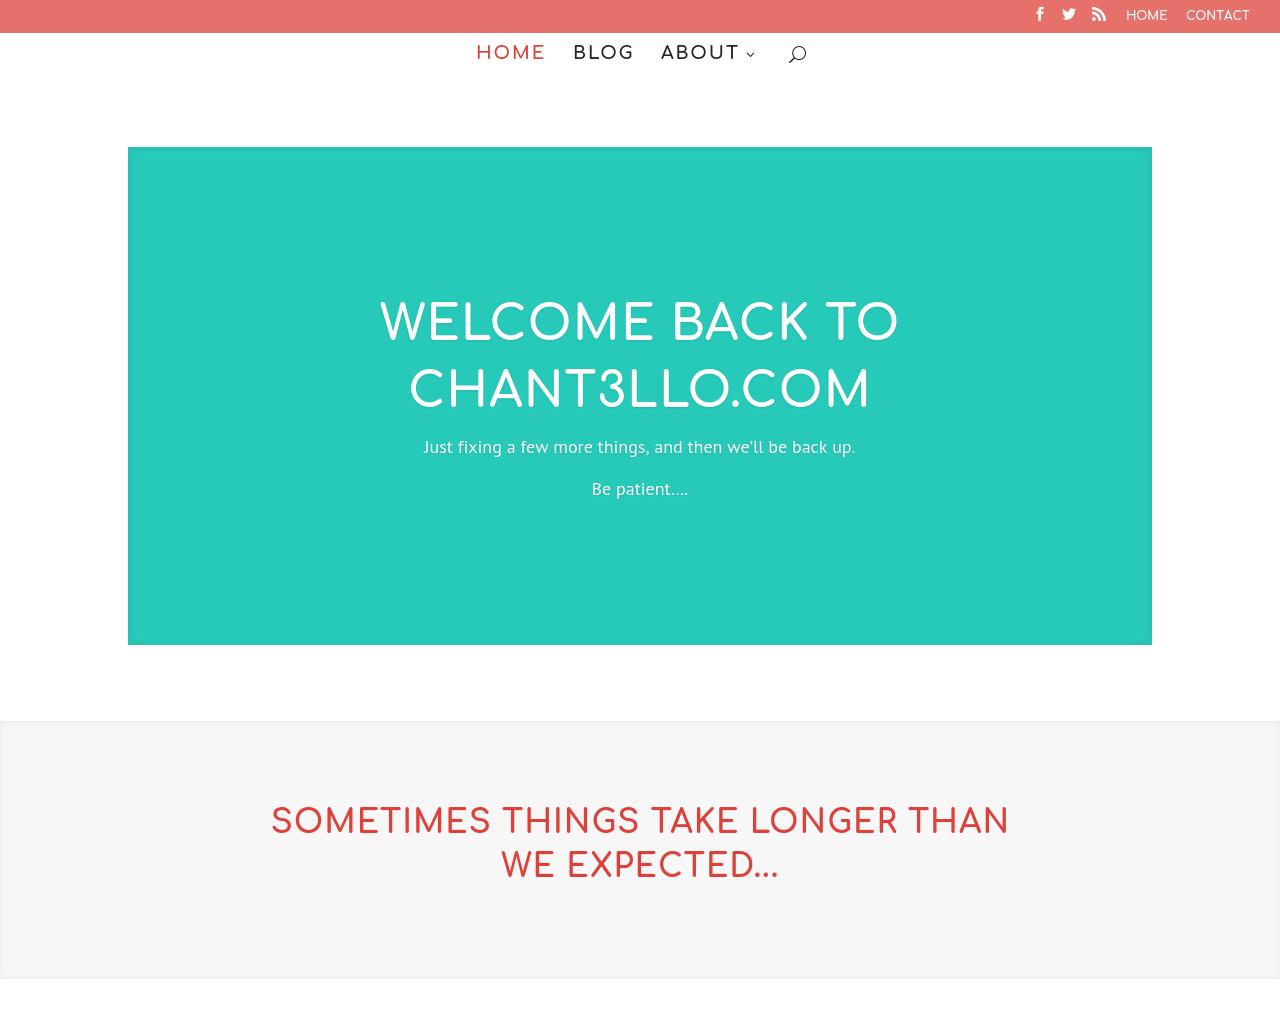 Chant3llo's-Blog-Advertising-Reviews-Pricing